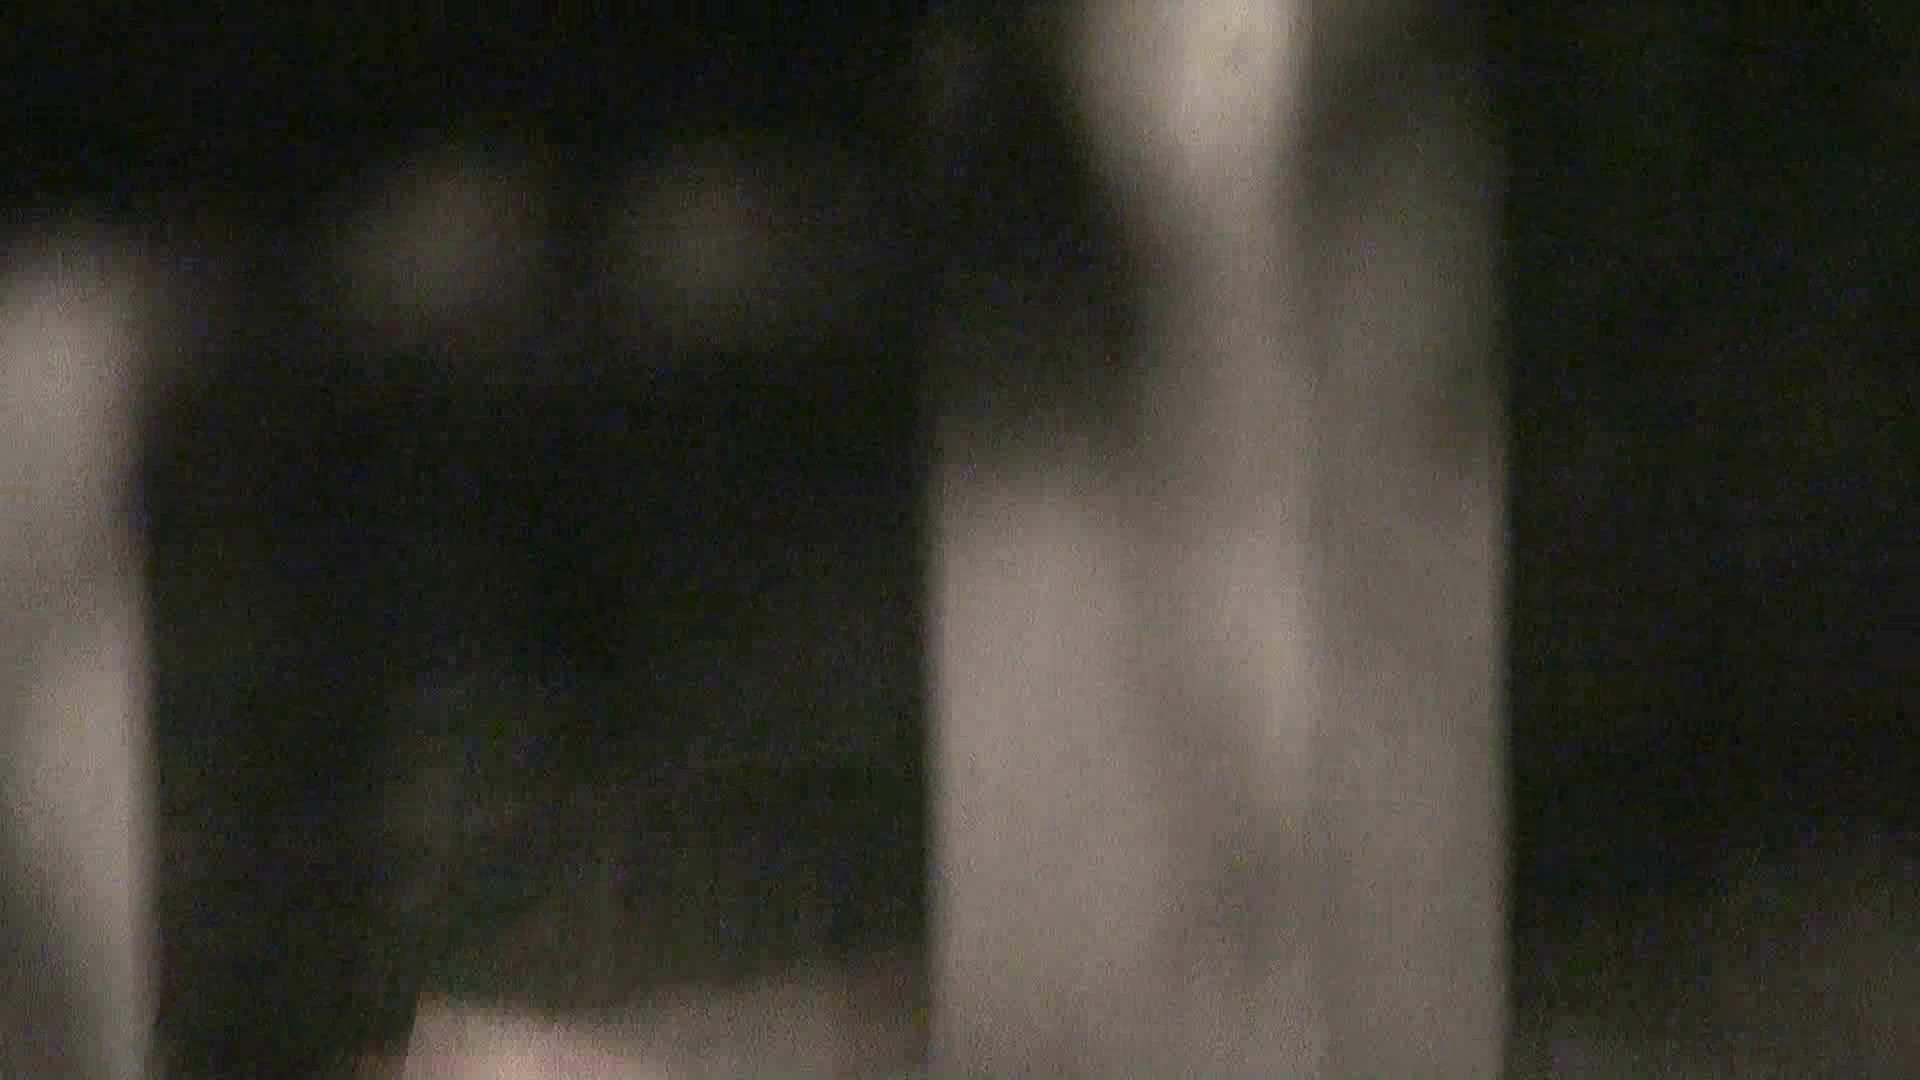 Aquaな露天風呂Vol.318 露天風呂編 | 盗撮シリーズ  109PIX 3